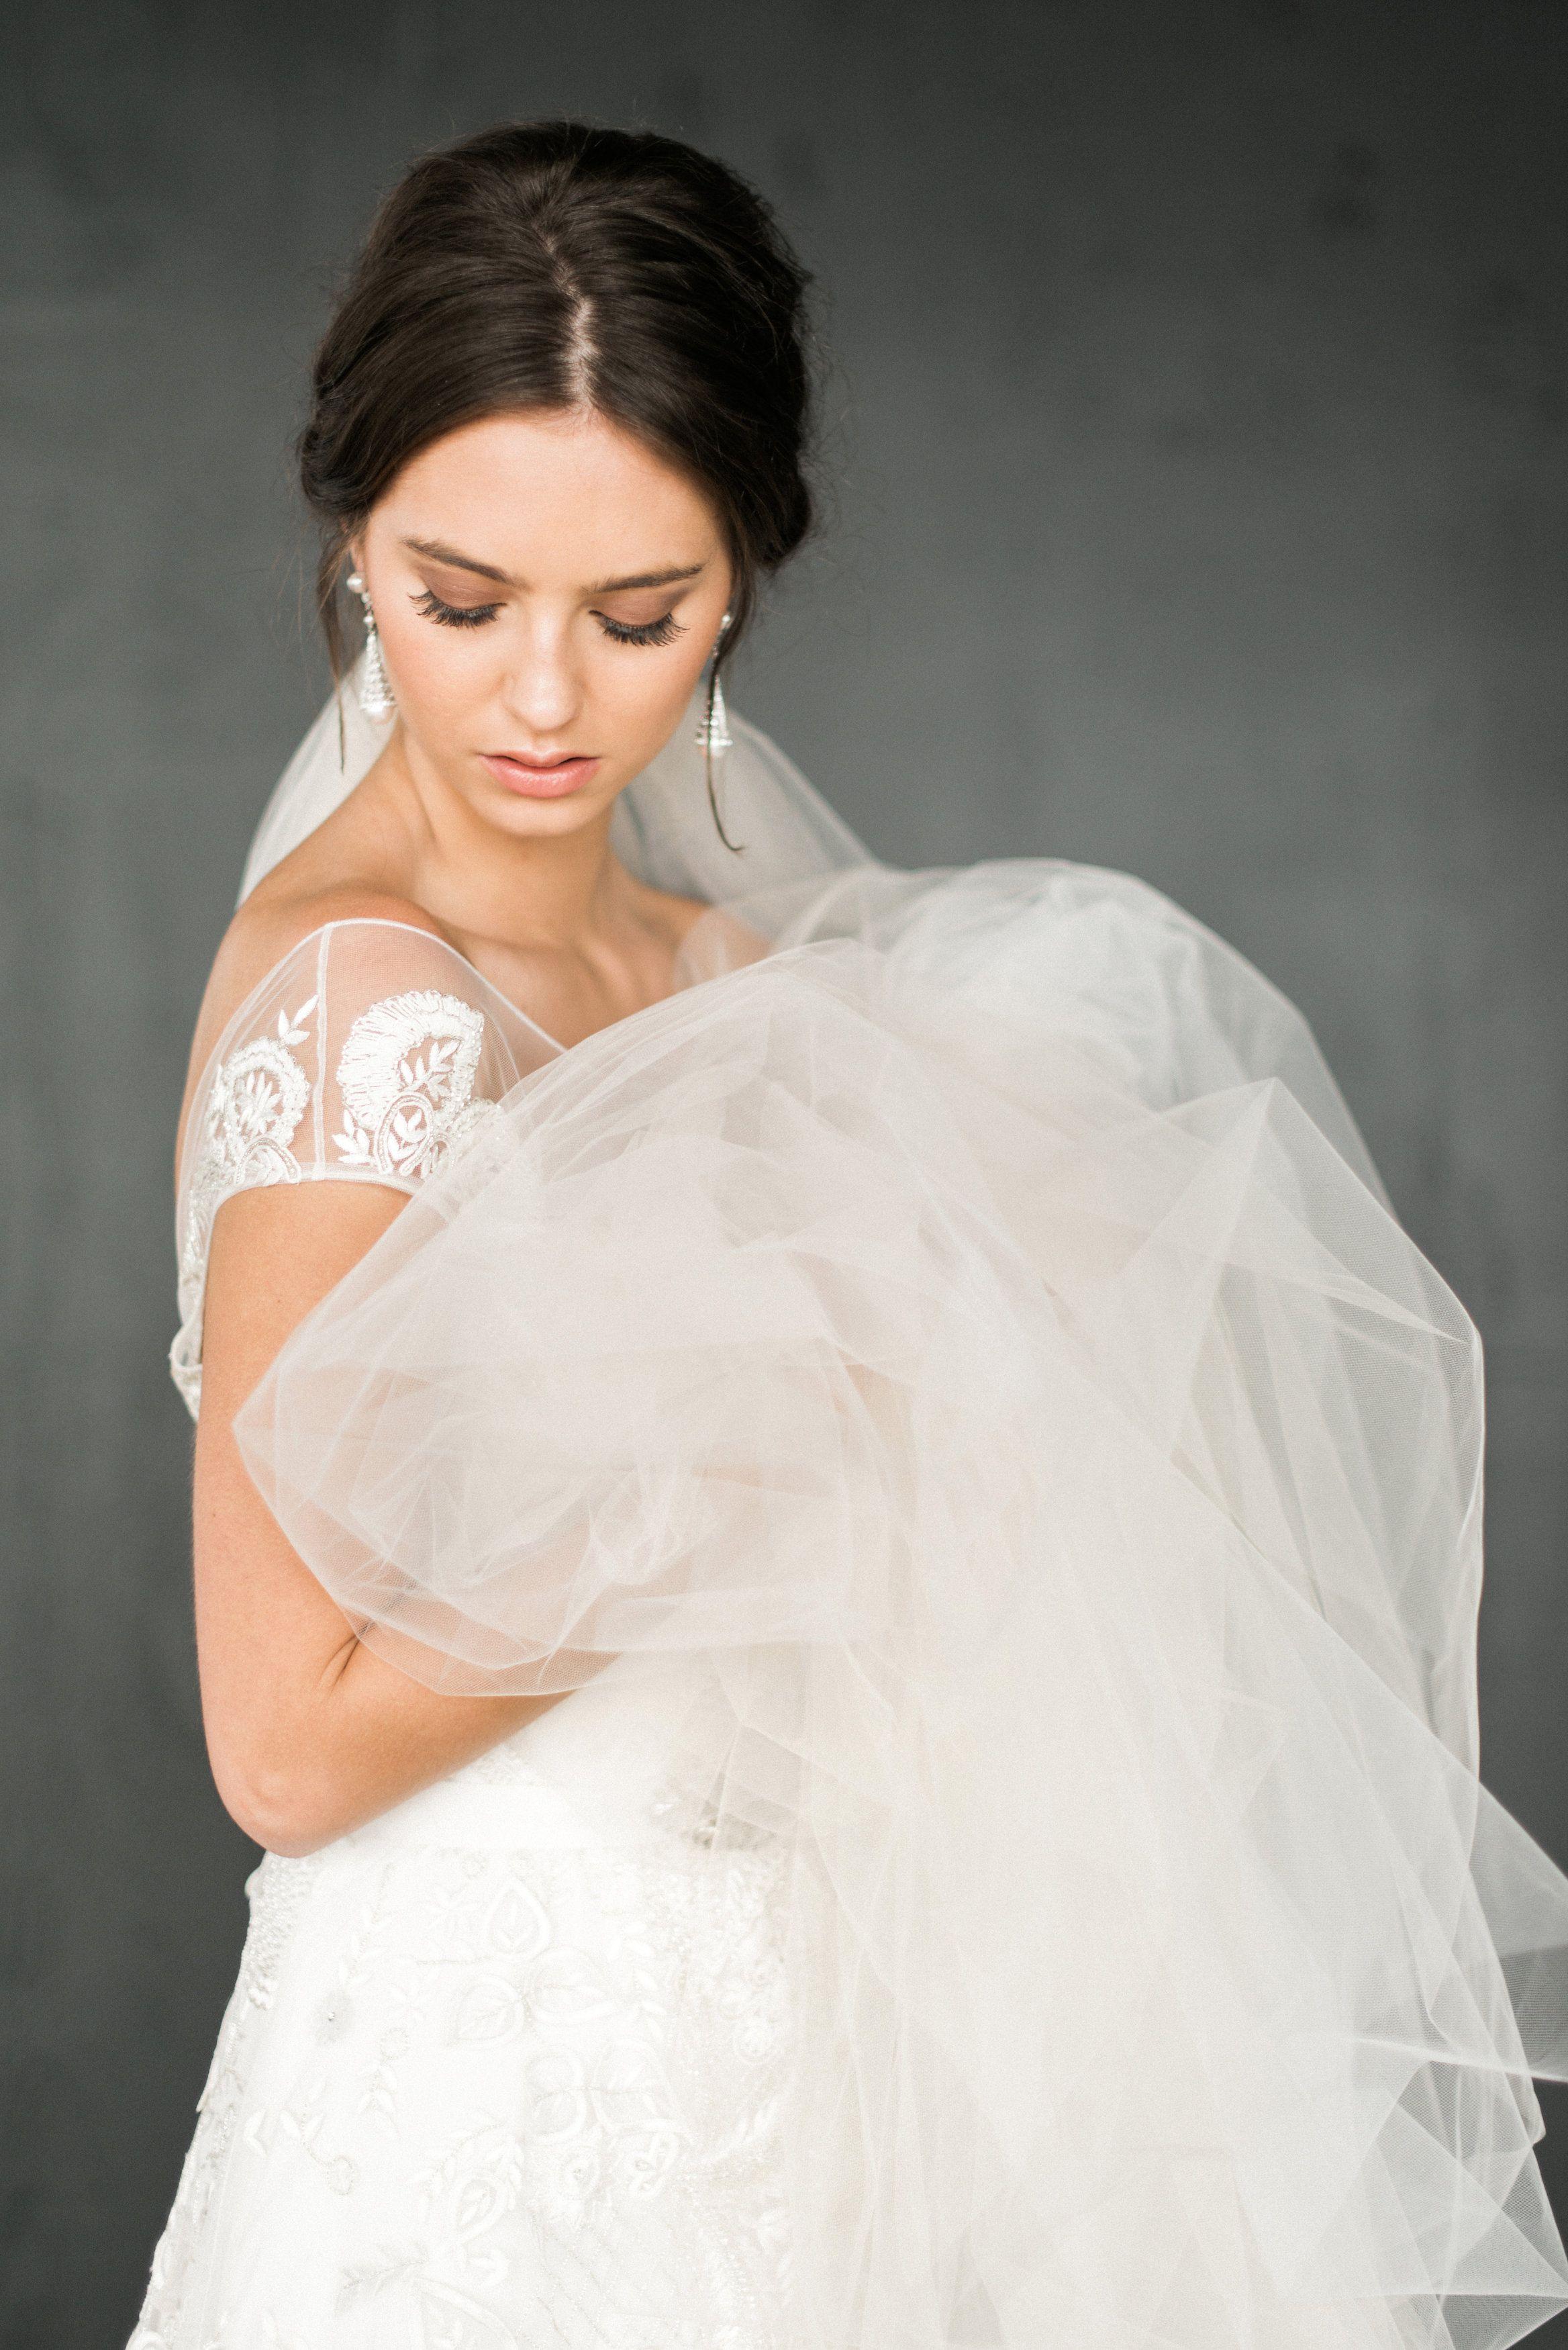 A rhinestone wedding dress to inspire a midnight kiss rustic white